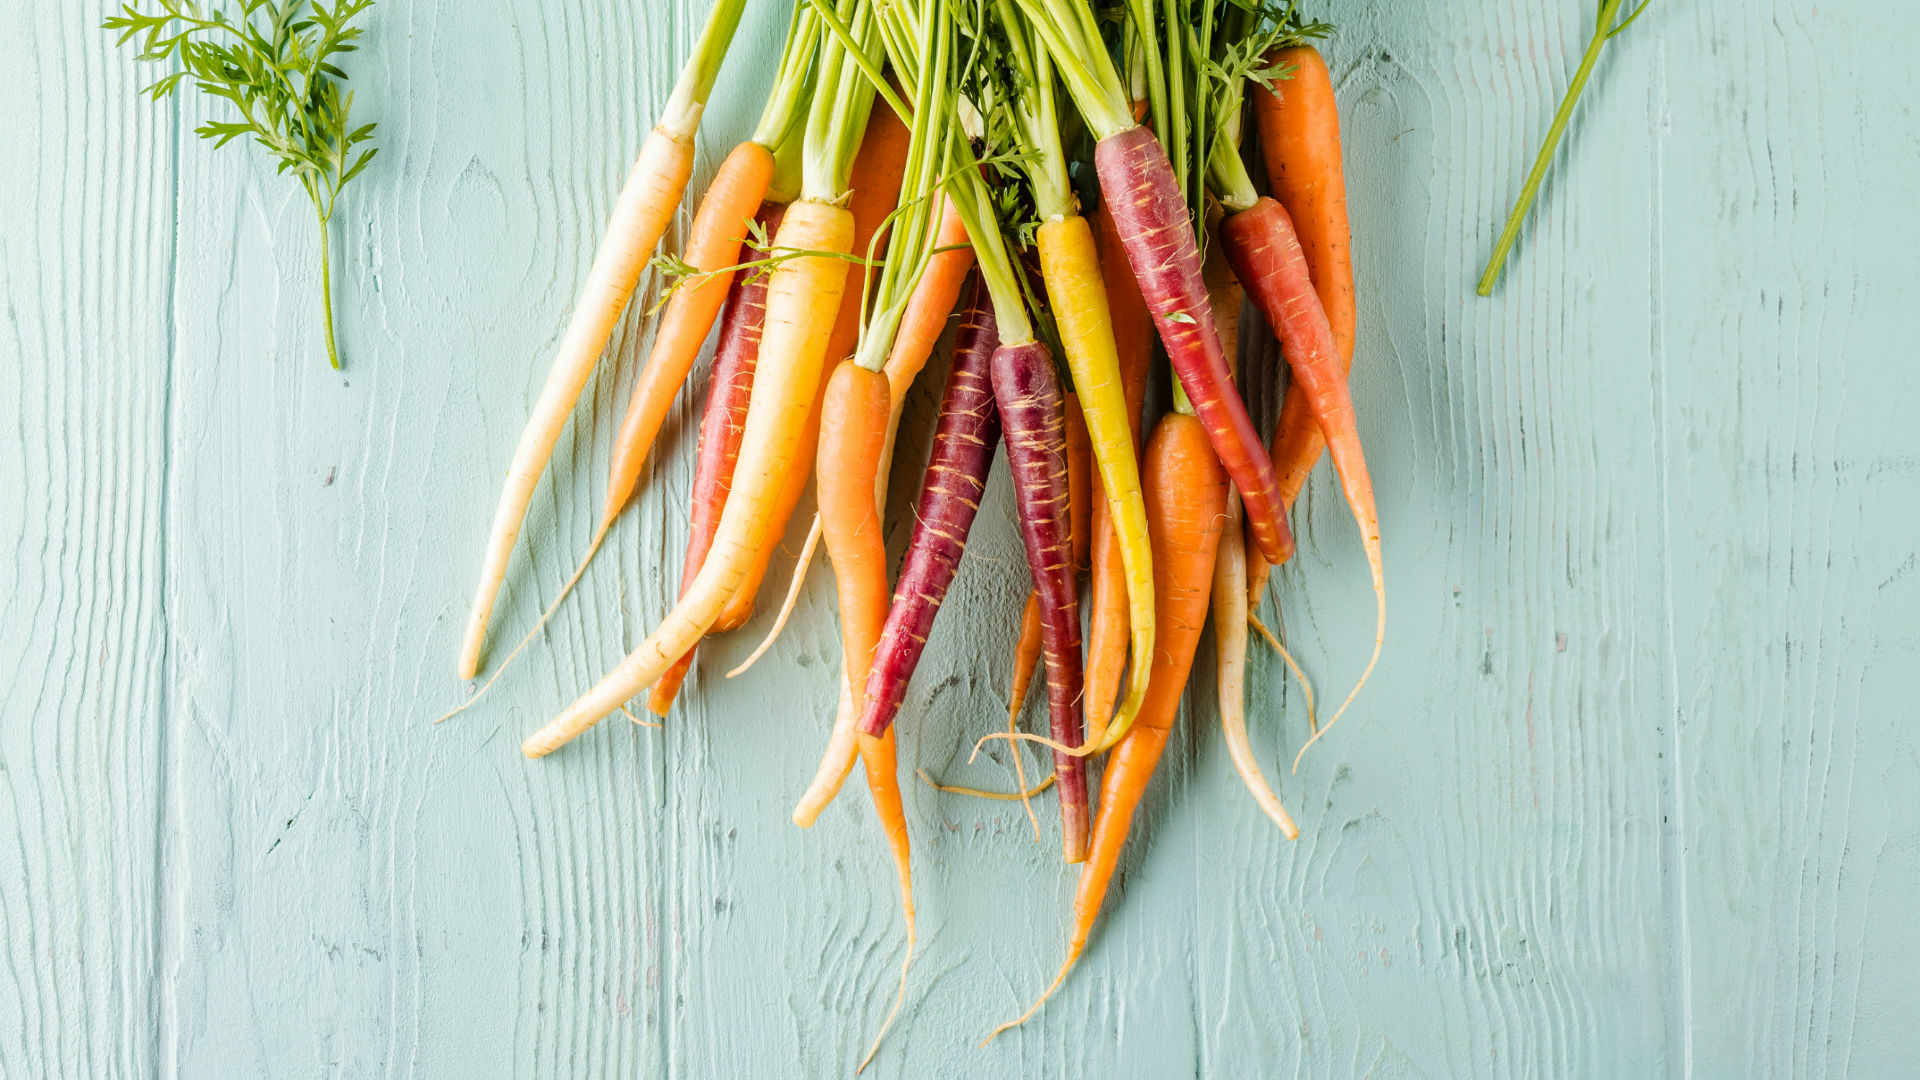 zanahorias, ensaladas Isabel